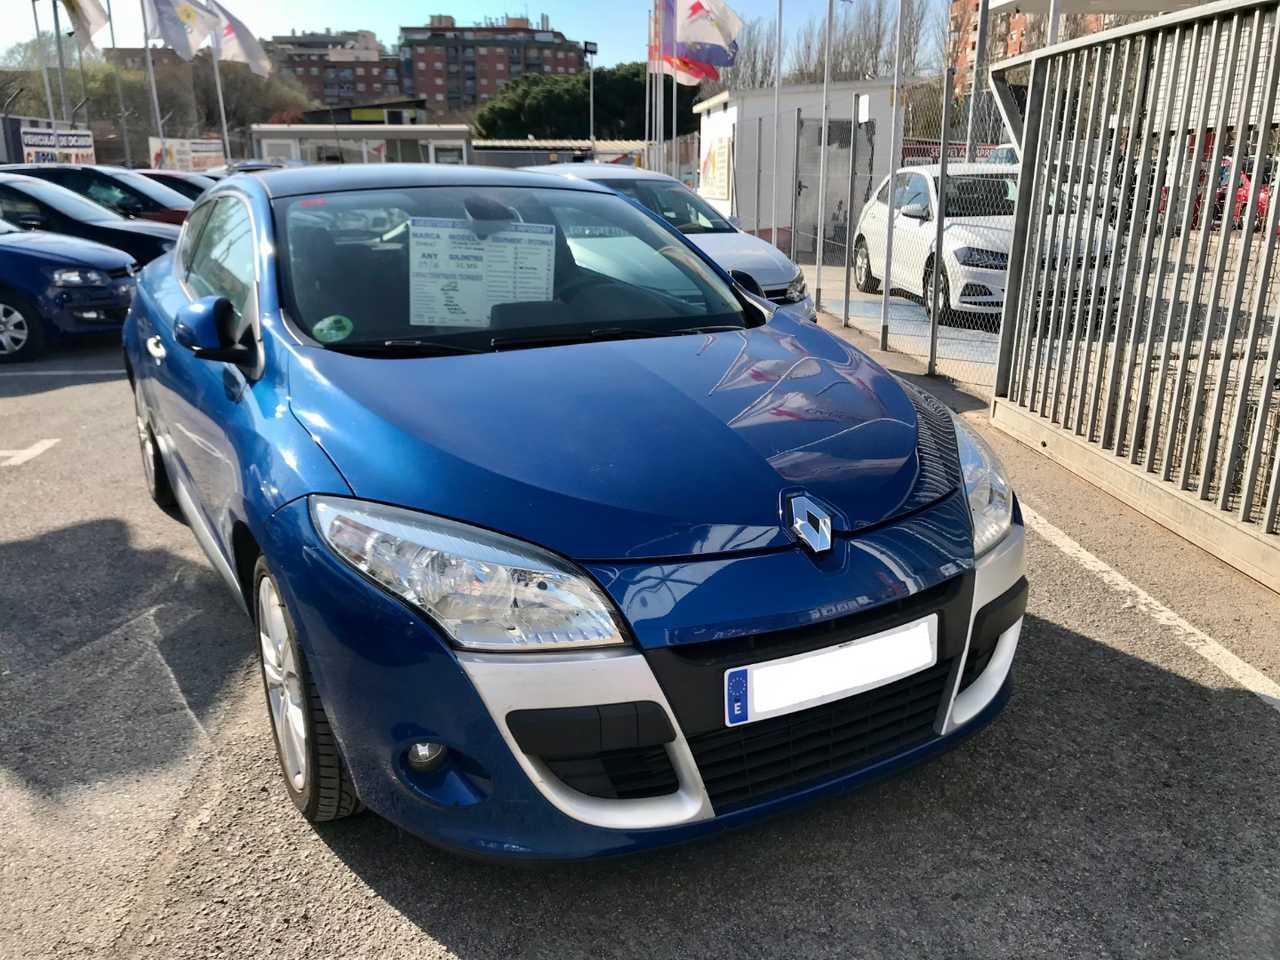 Renault Megane Coupe 1.4 130 CV SPORT DINAMIC   - Foto 1